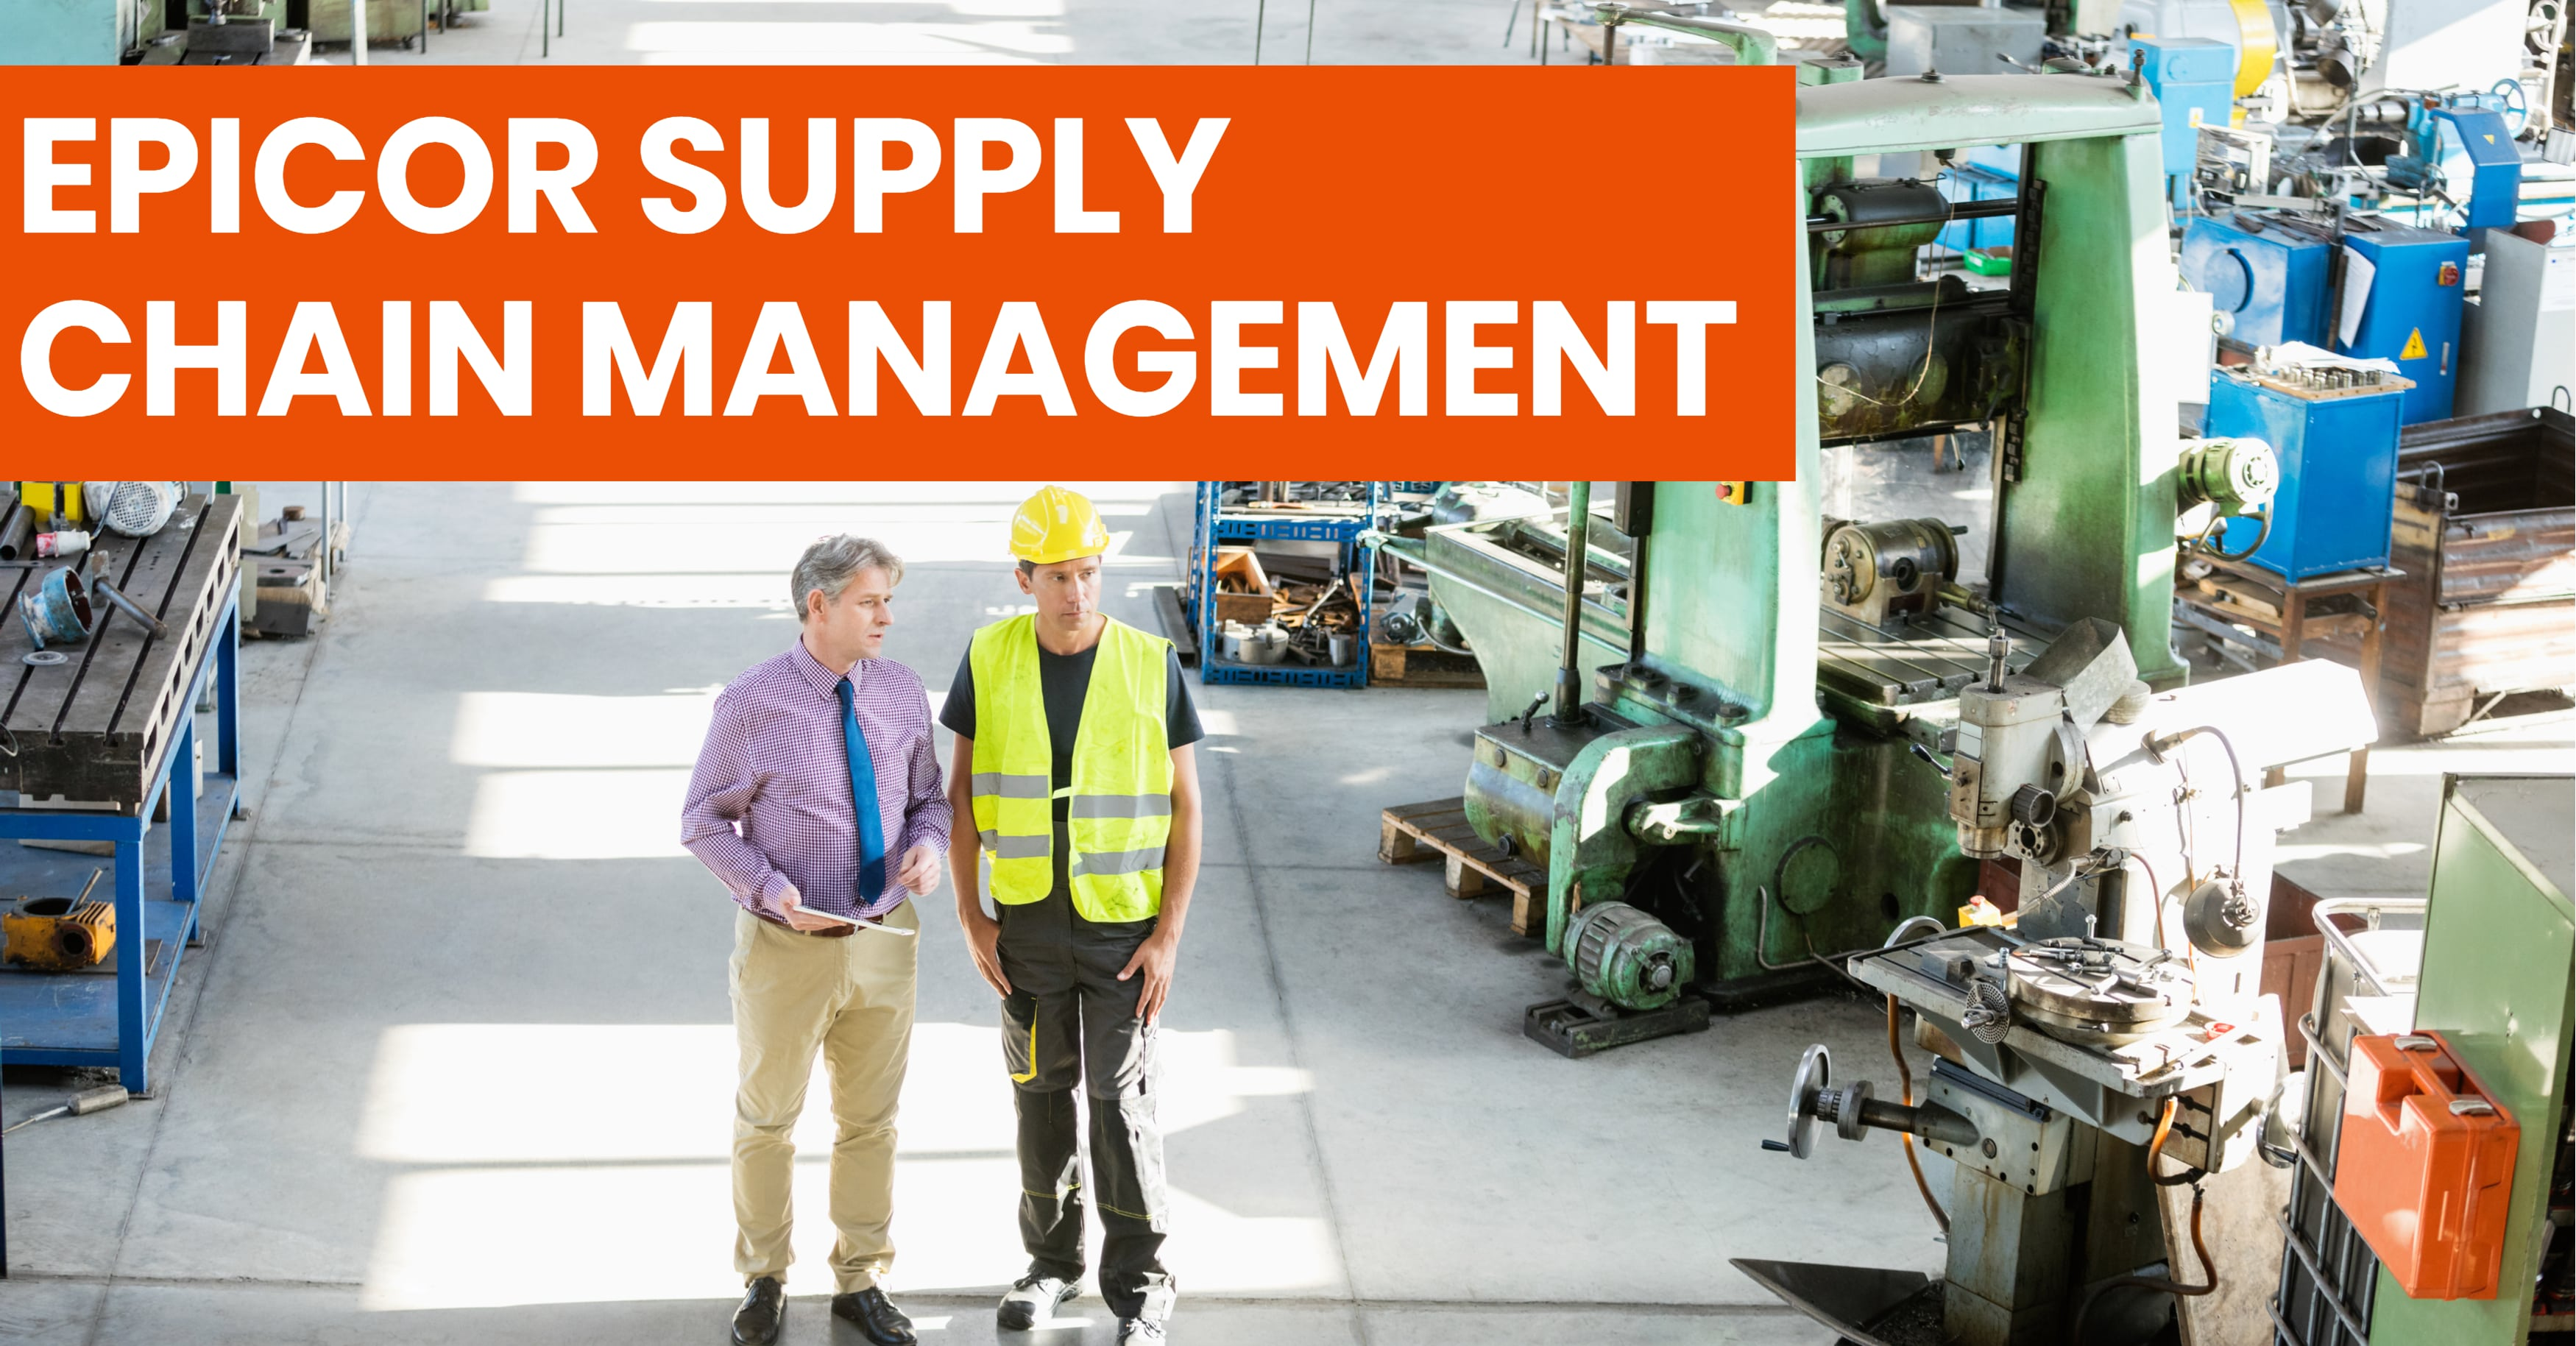 Epicor Supply Chain Management